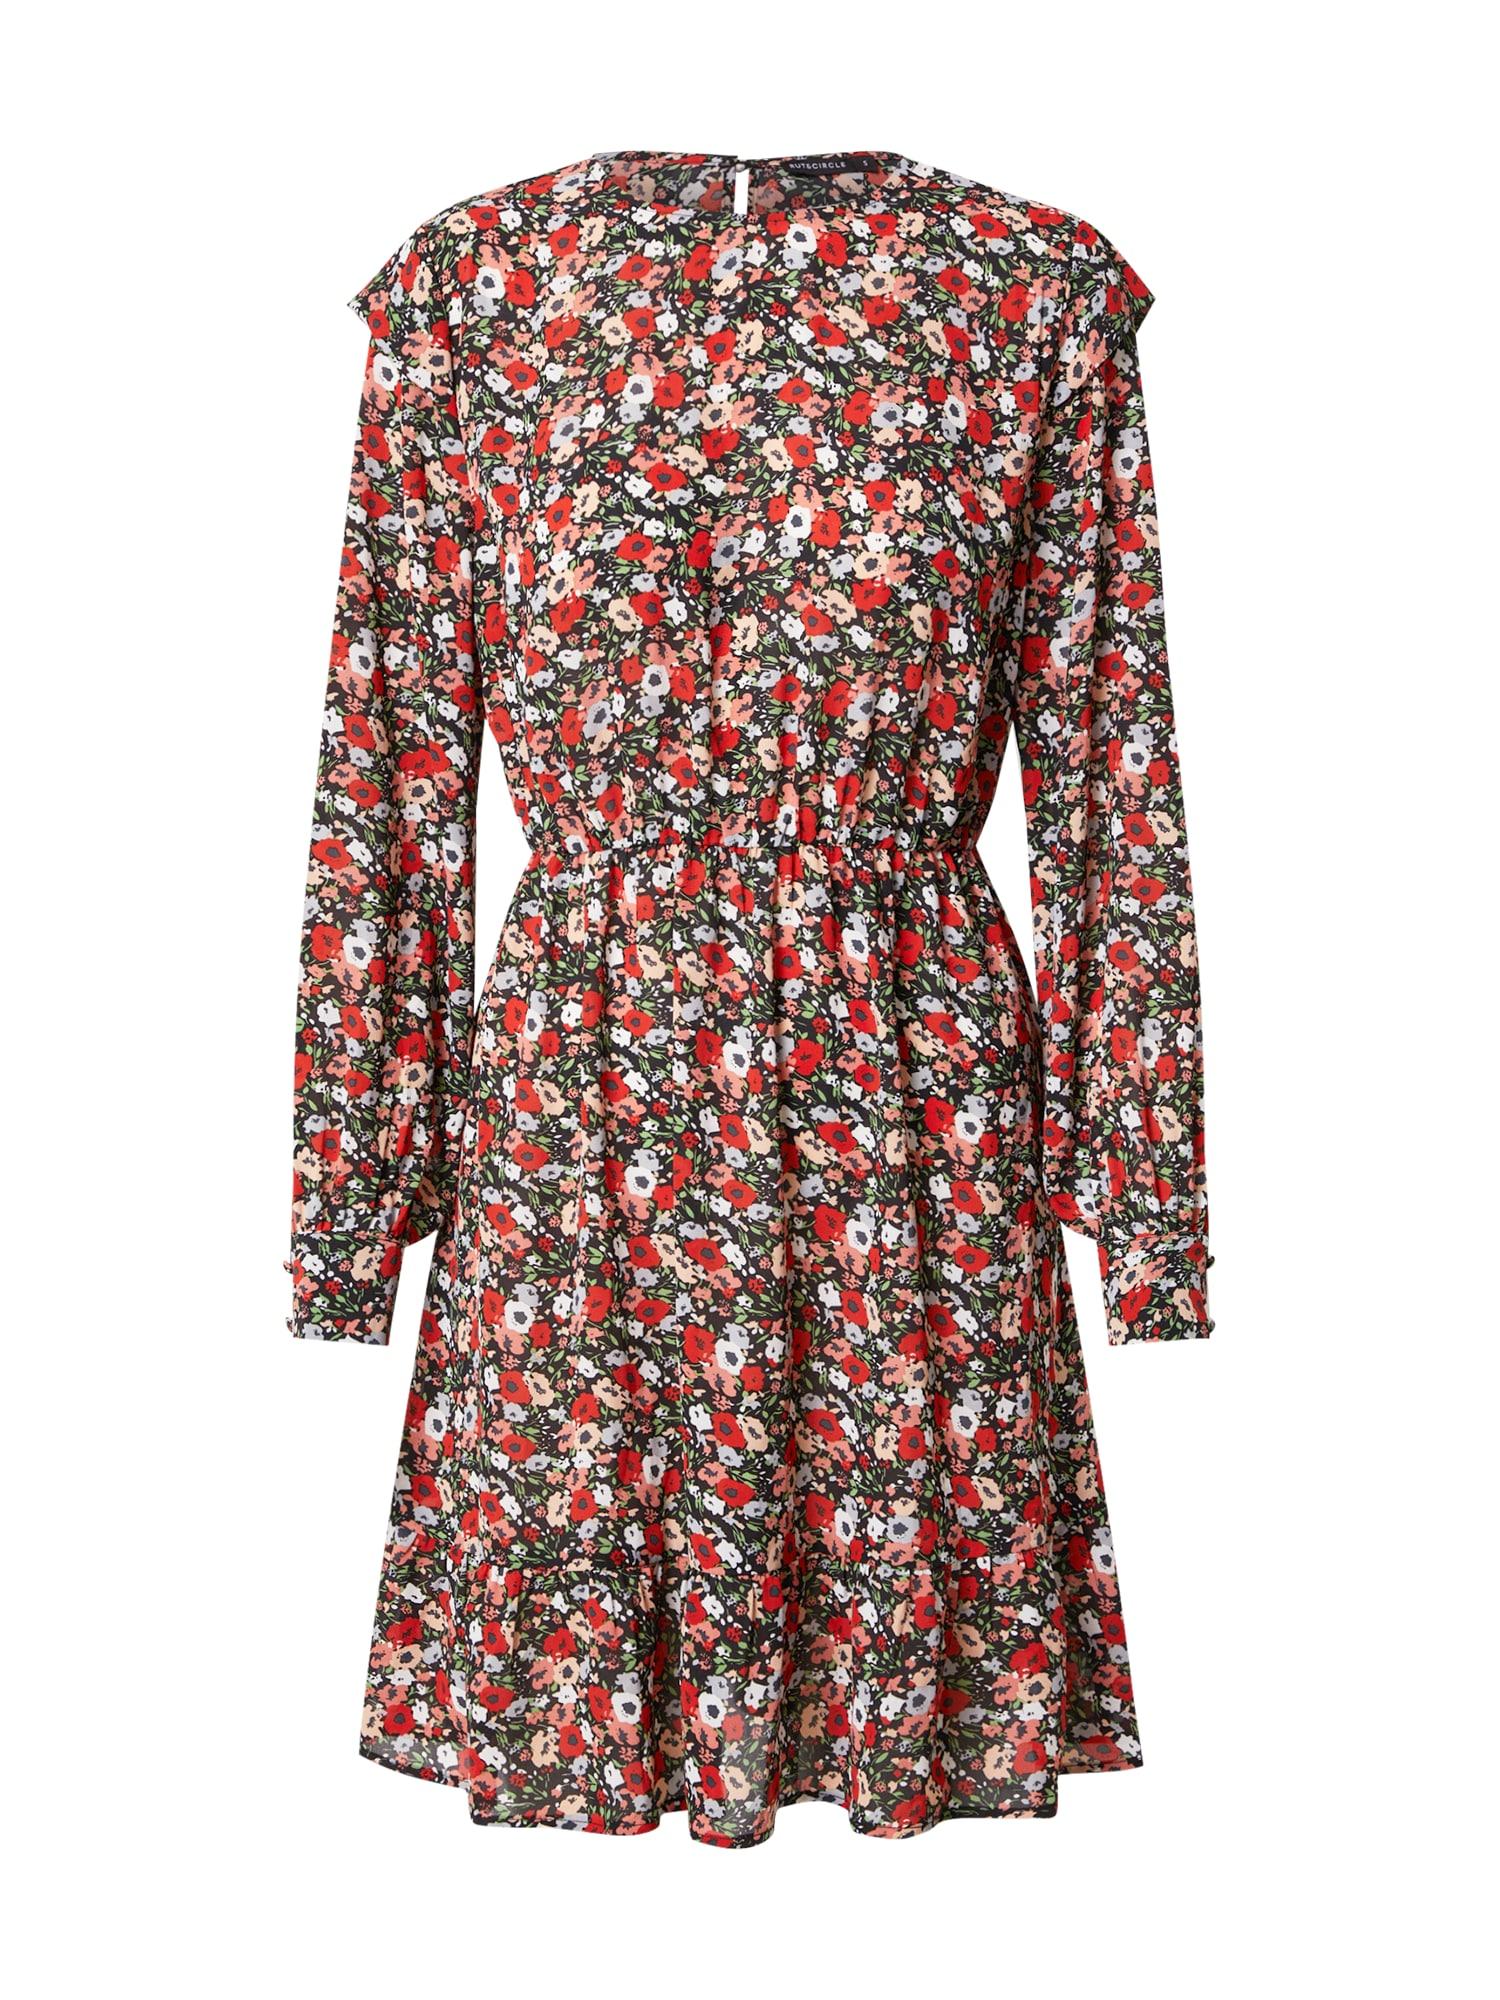 Rut & Circle Šaty 'SAVANNAH'  červená / bílá / zelená / černá